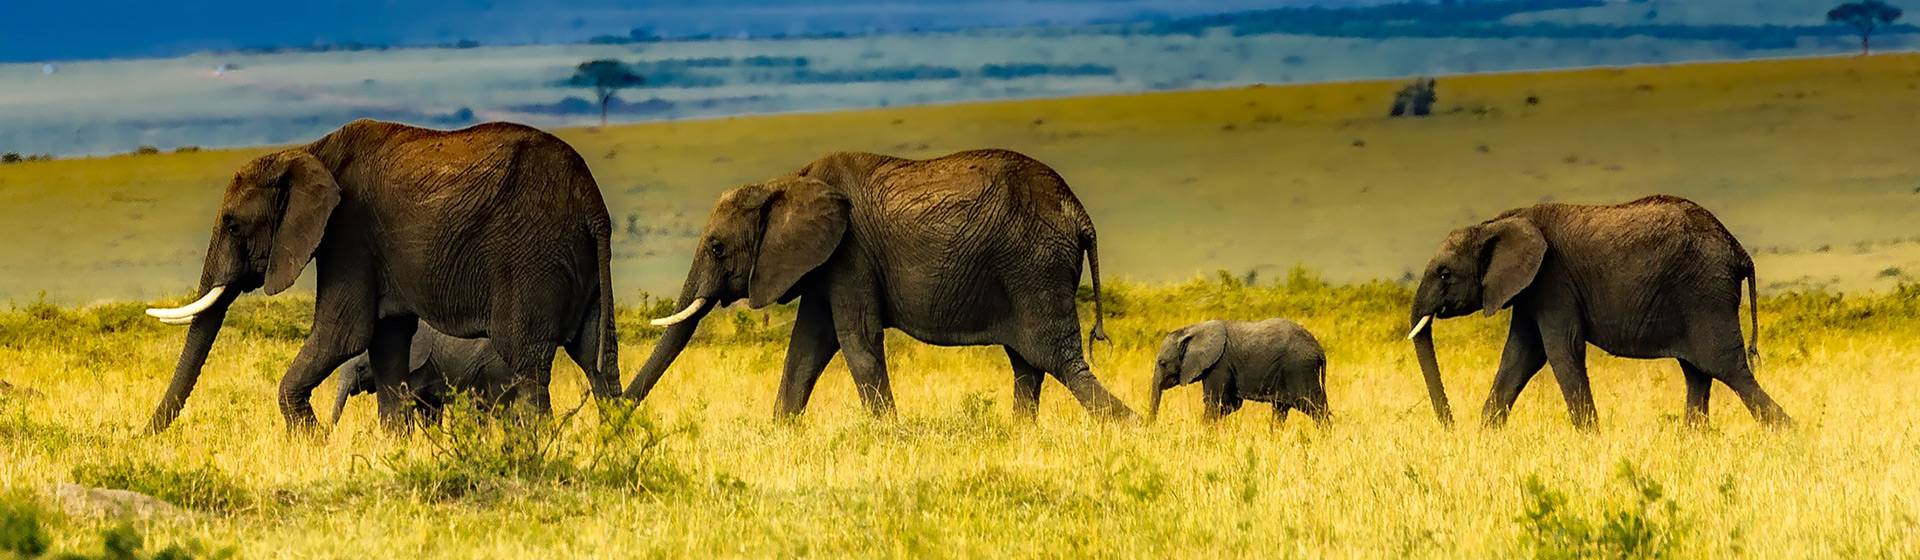 Krugar Safari Park and Cape Town